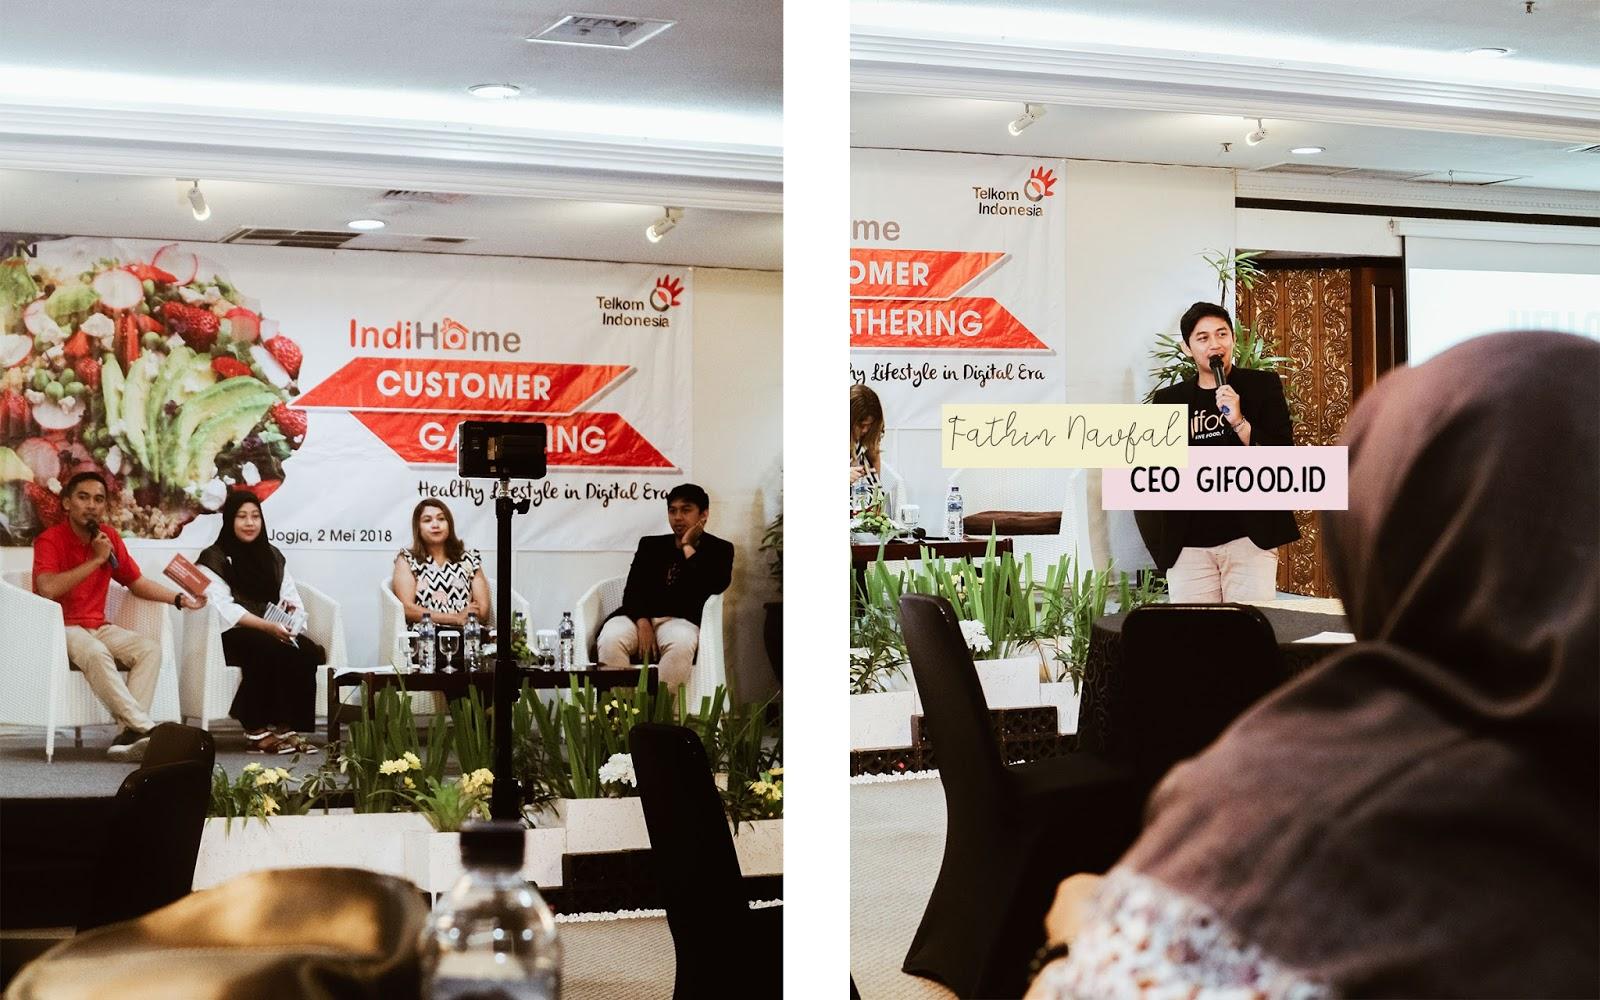 Para Pembicara: Ibu Sri Hartini dari UGM, Mbak Wiwin dari Optimum Healthy Cafe dan Fathin Naufal dari Gifood.ID